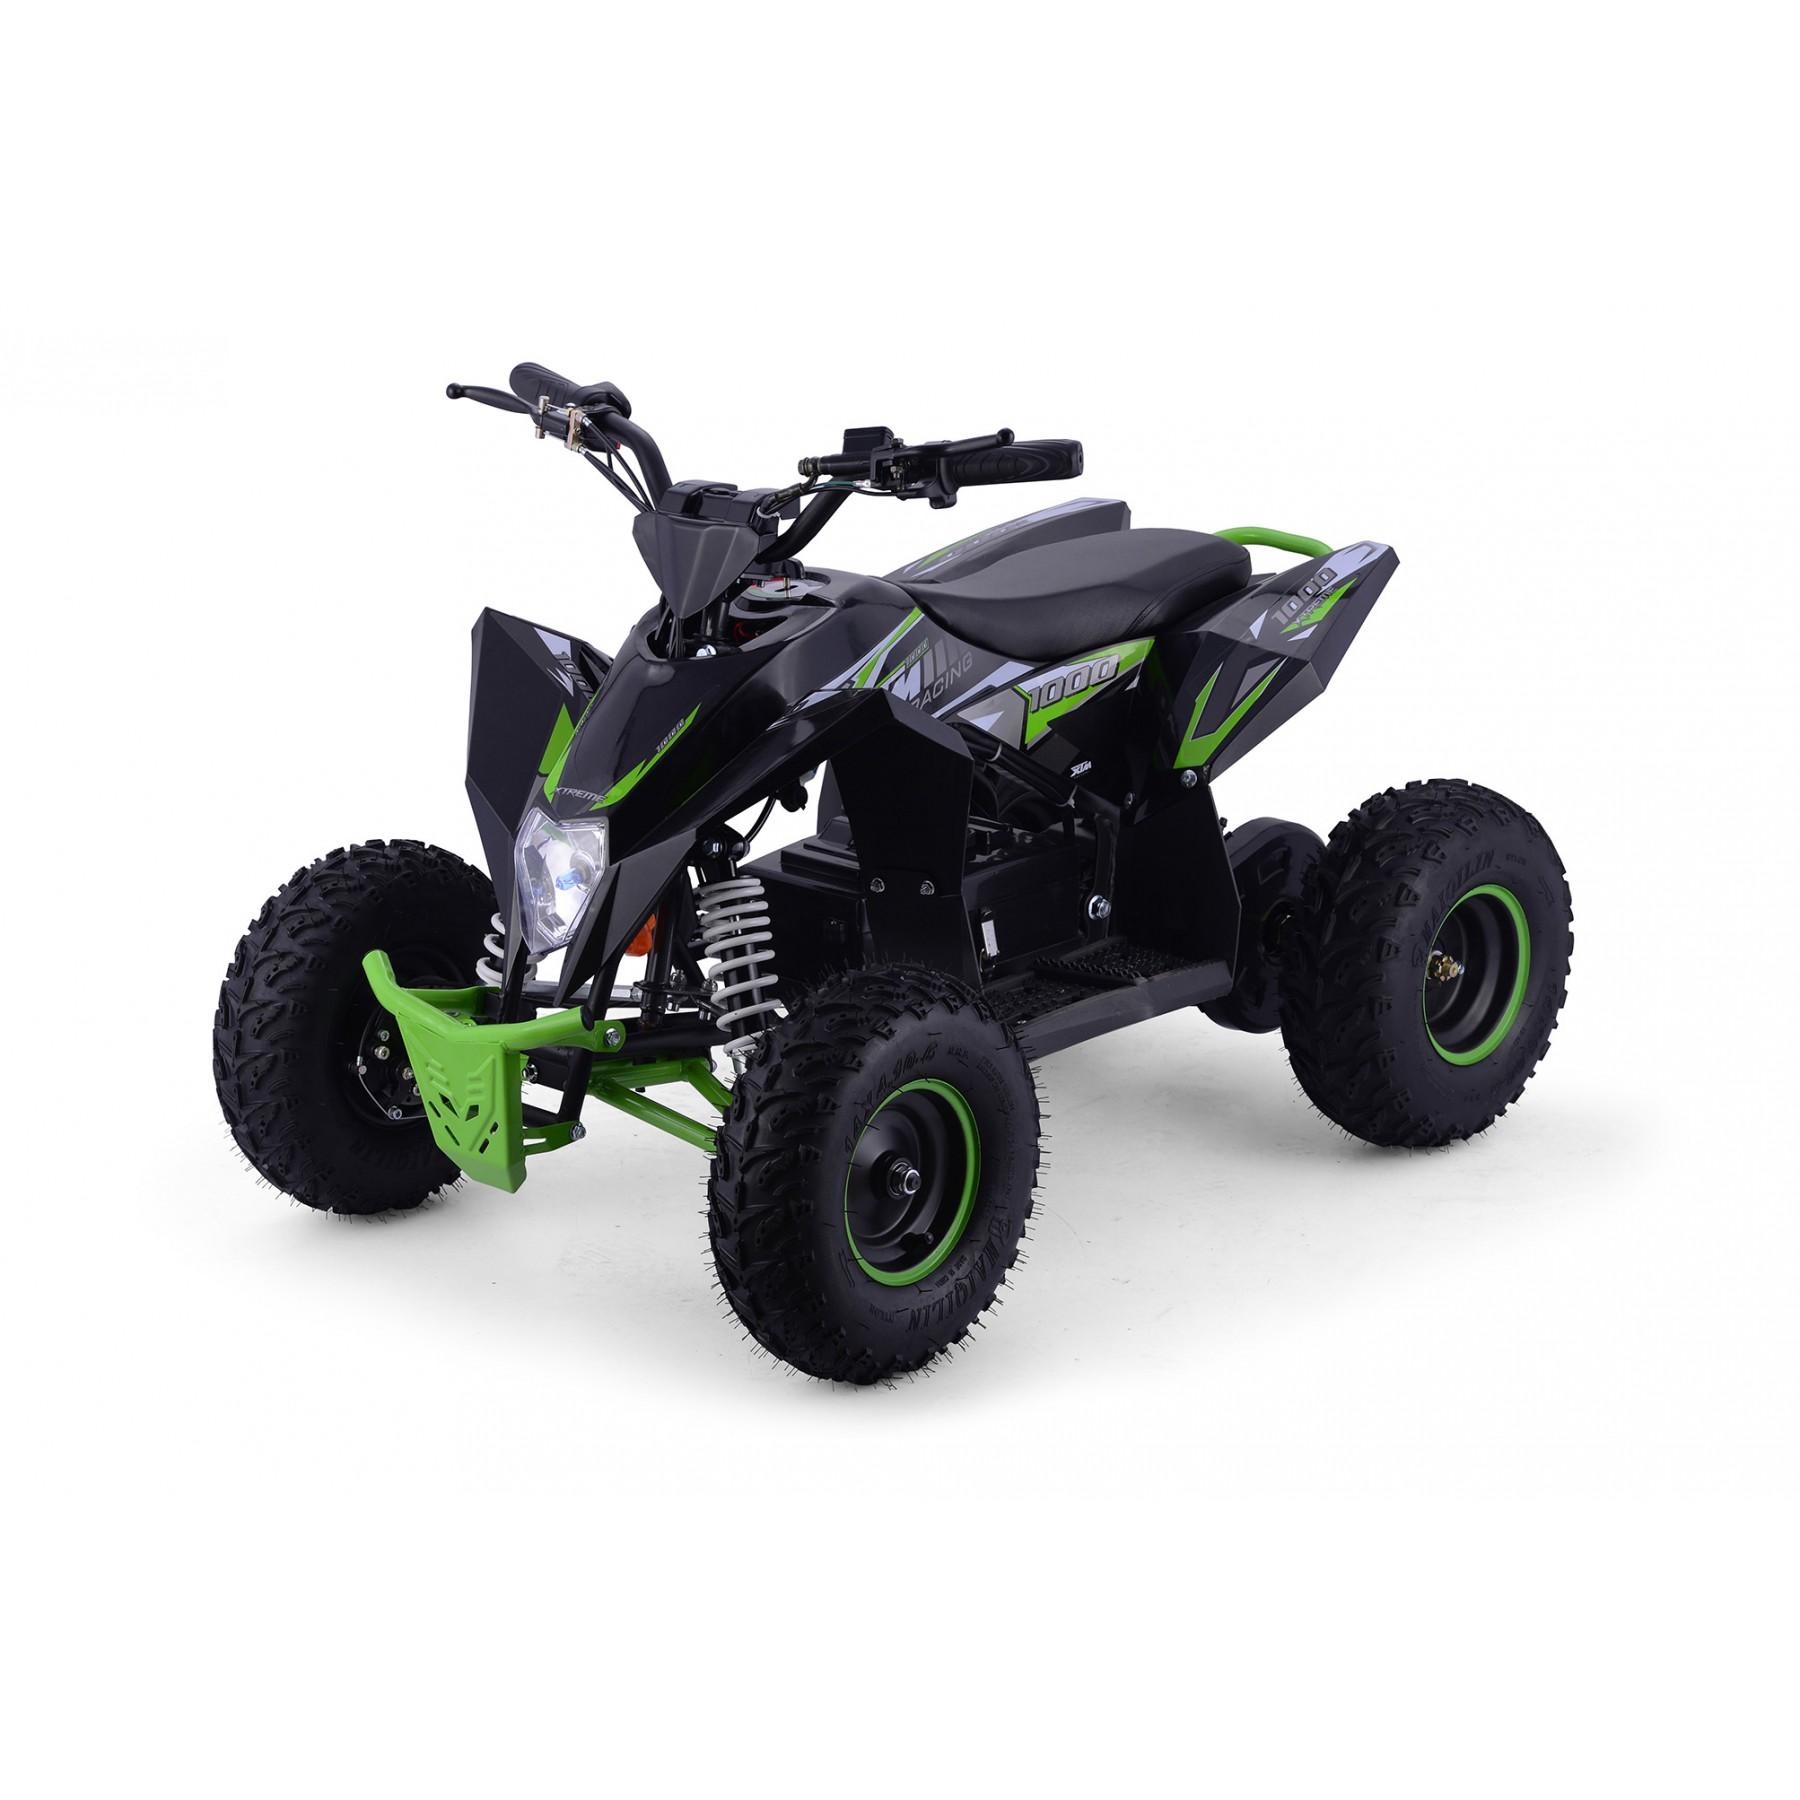 XTM RACING 1000w QUAD BIKE BLACK GREEN